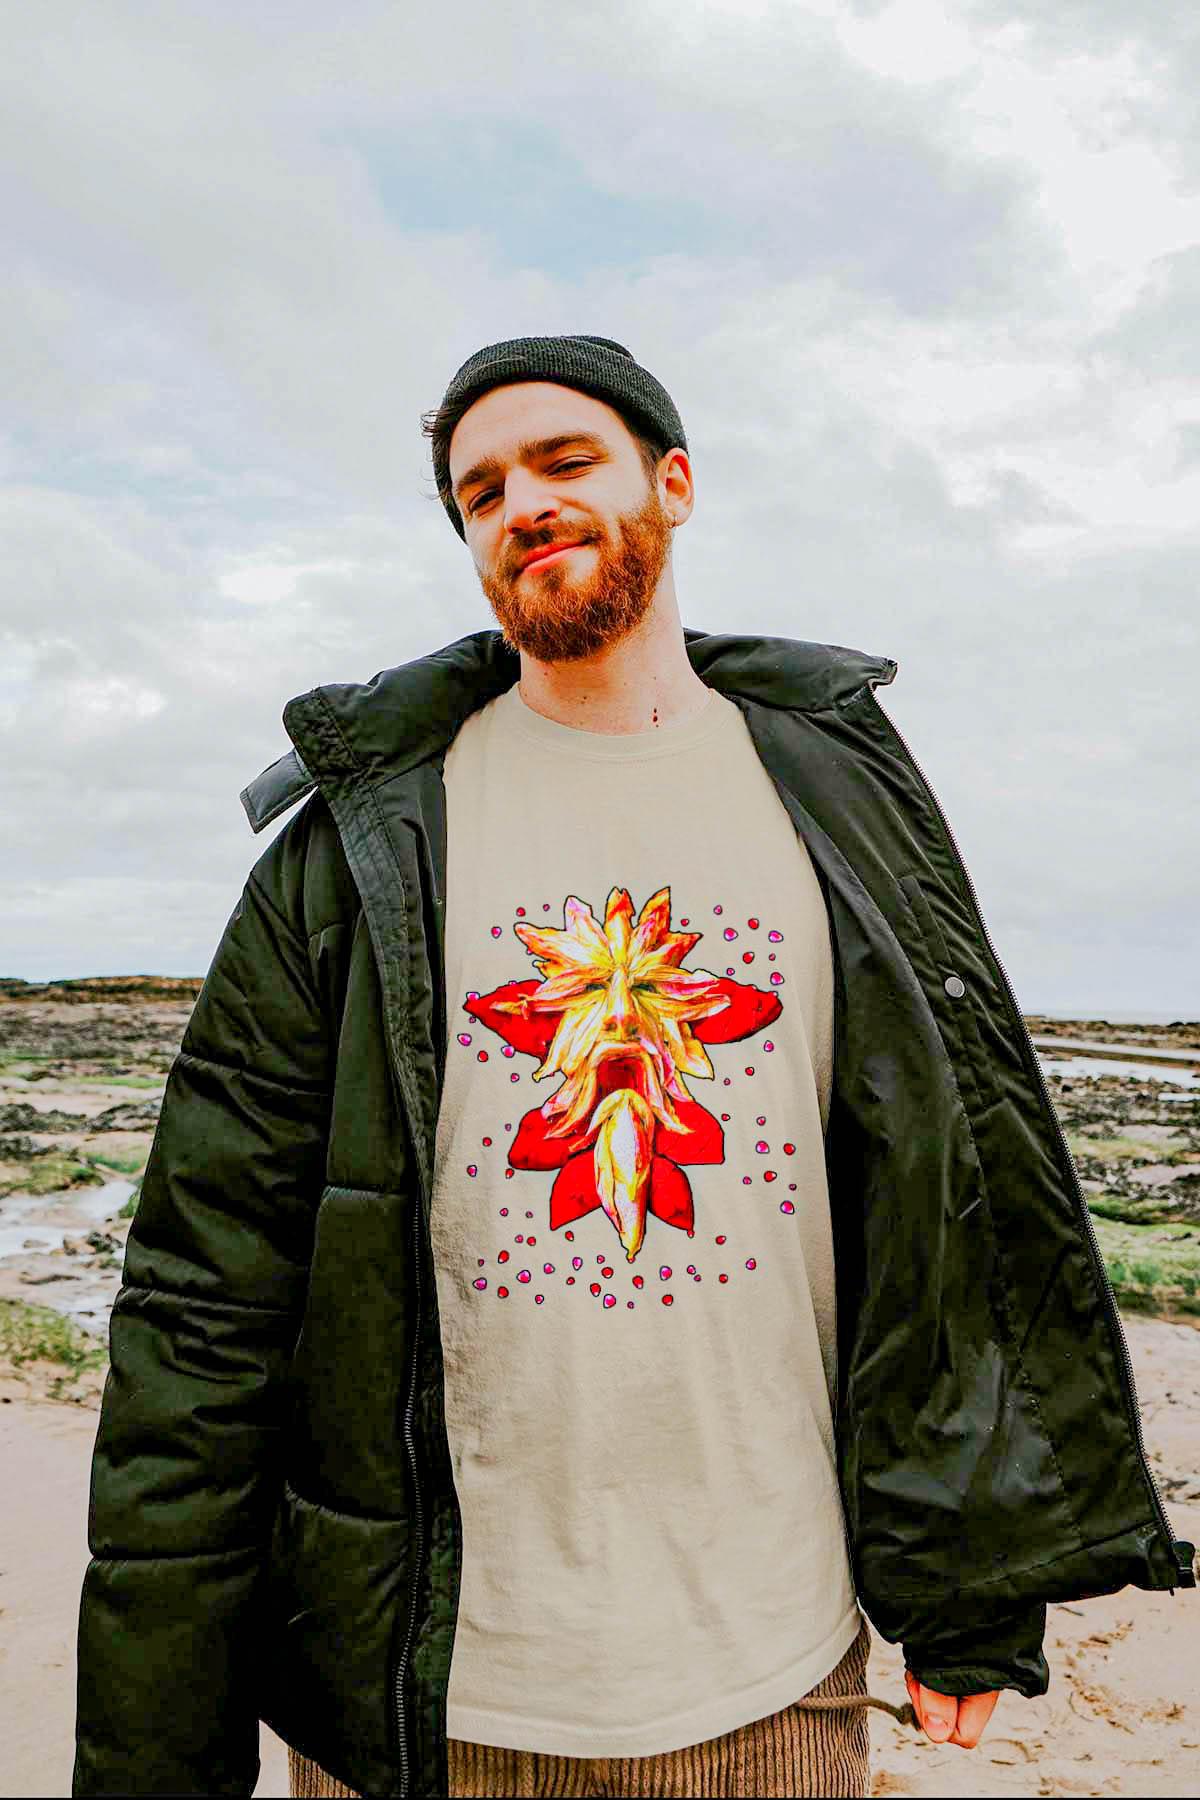 Man standing on beach wearing shirt by 91 APPAREL